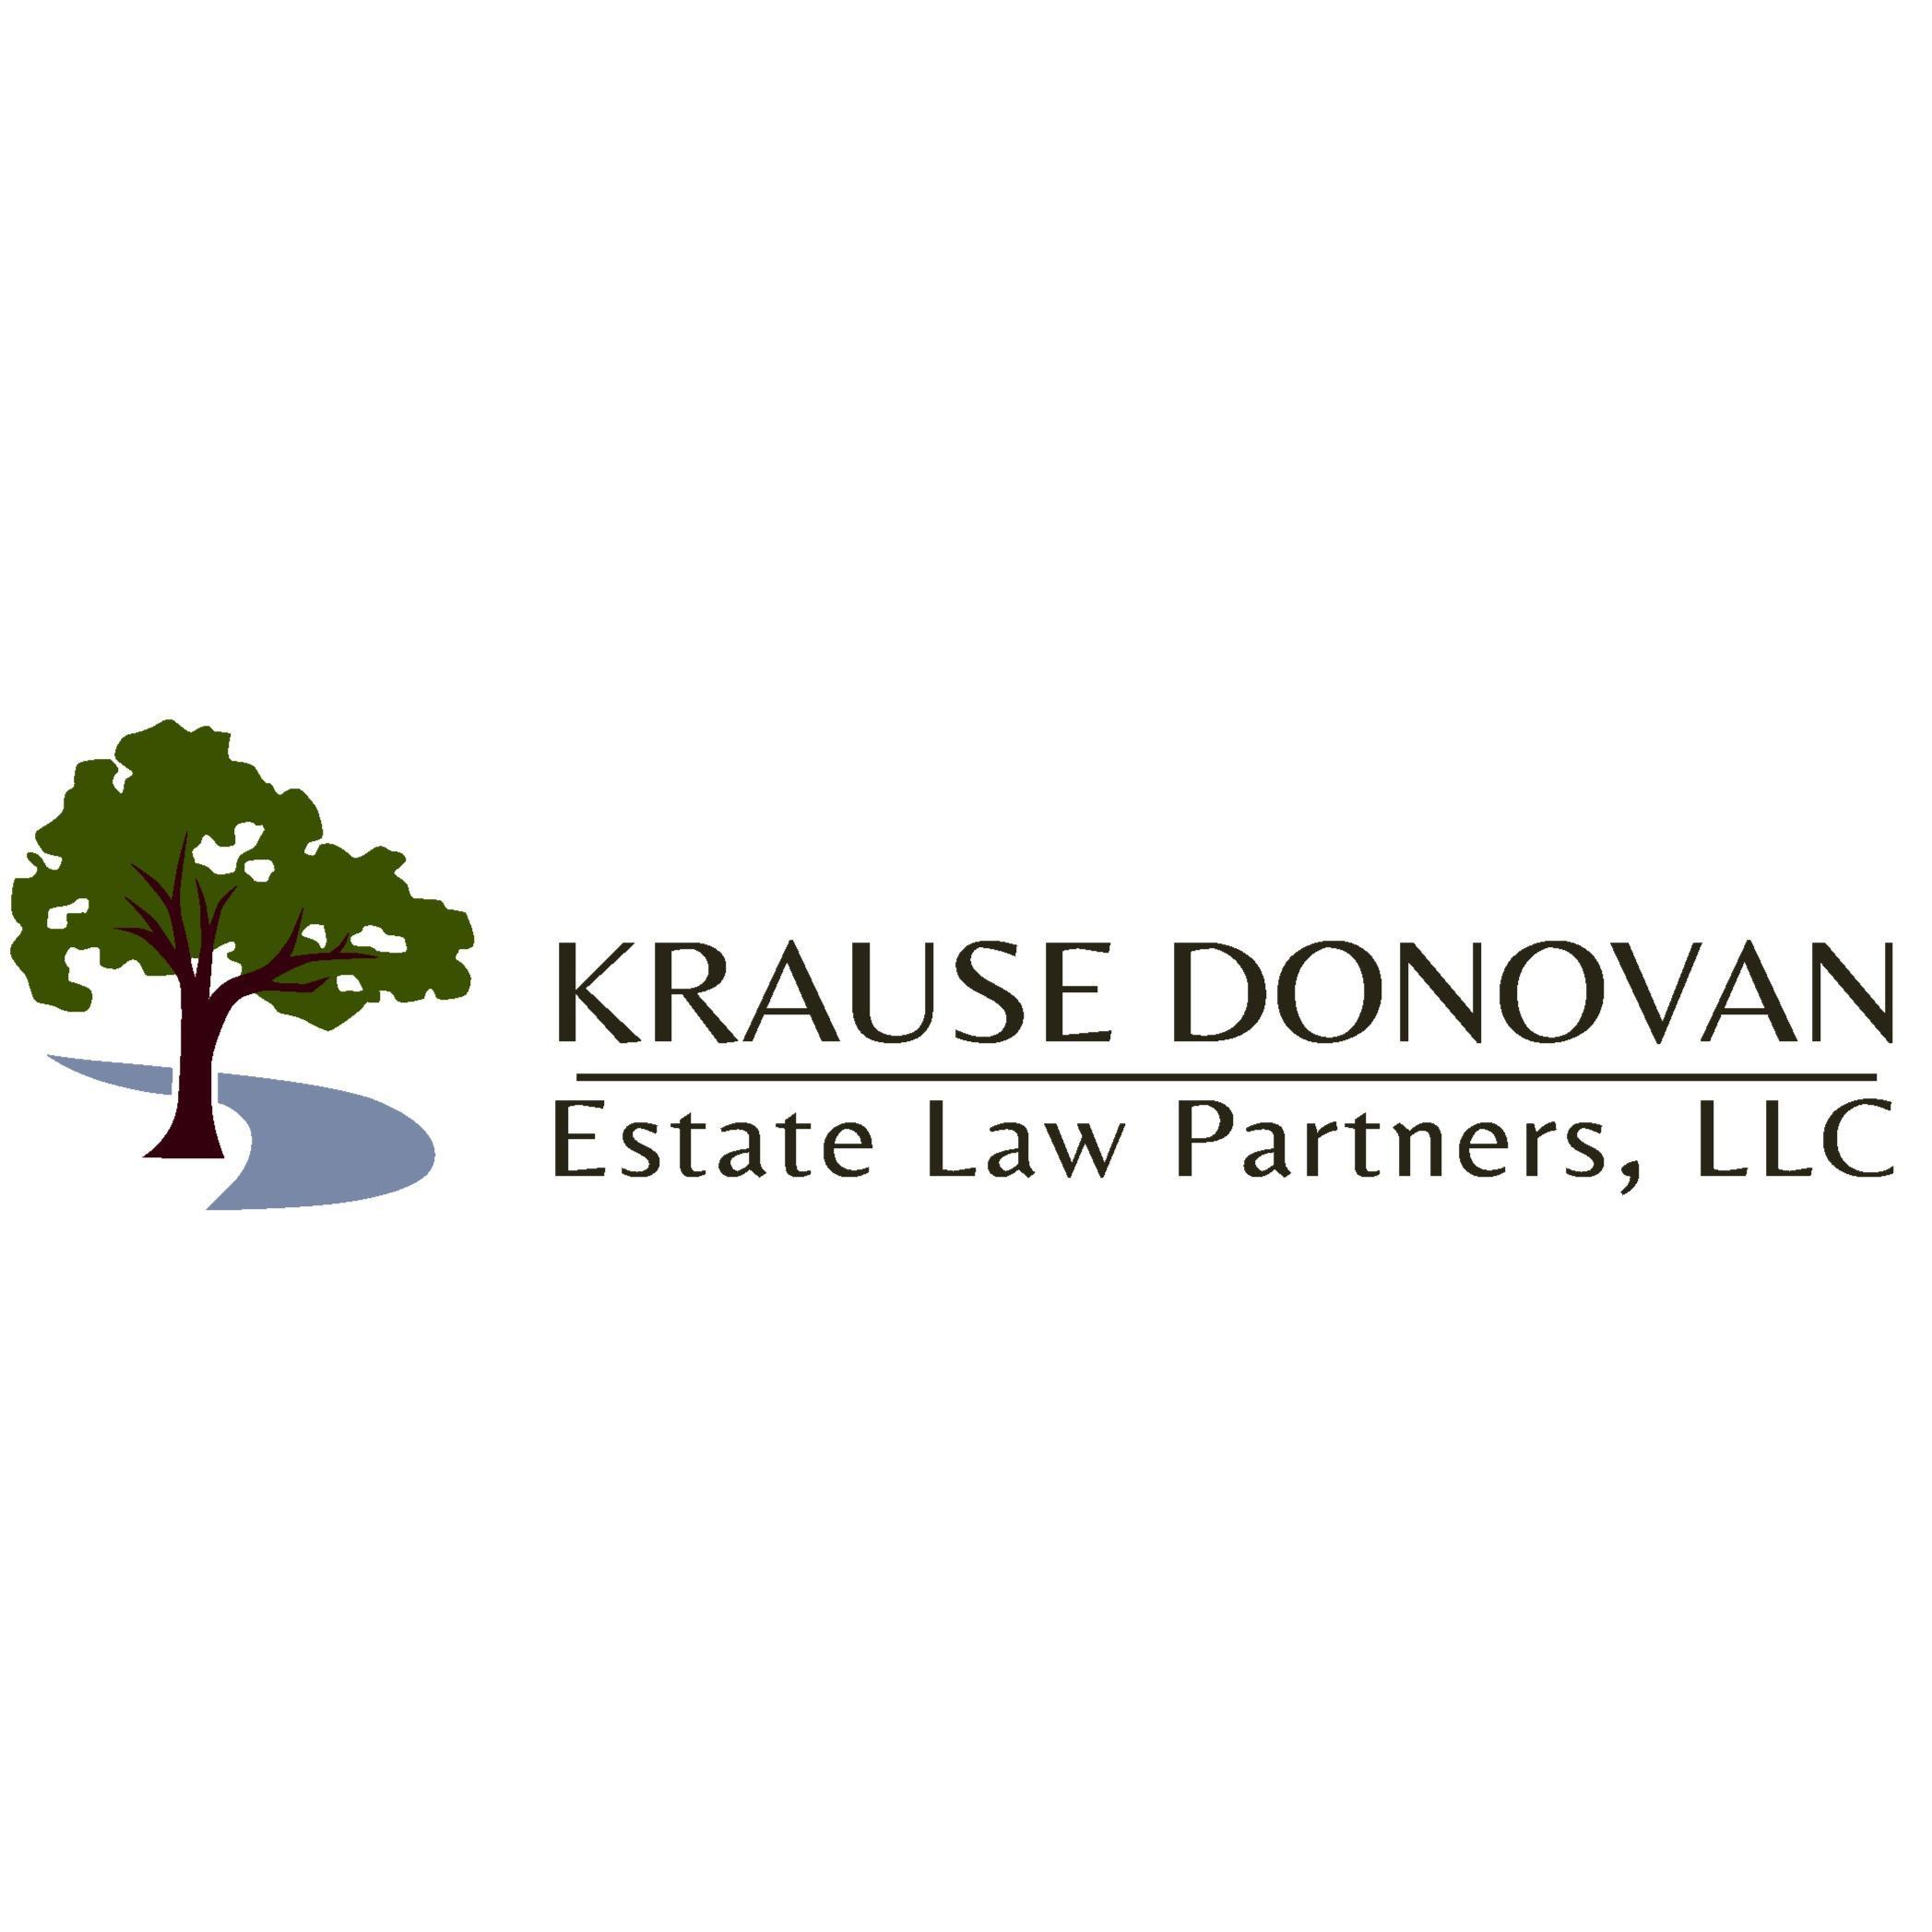 Krause Donovan Estate Law Partners, LLC